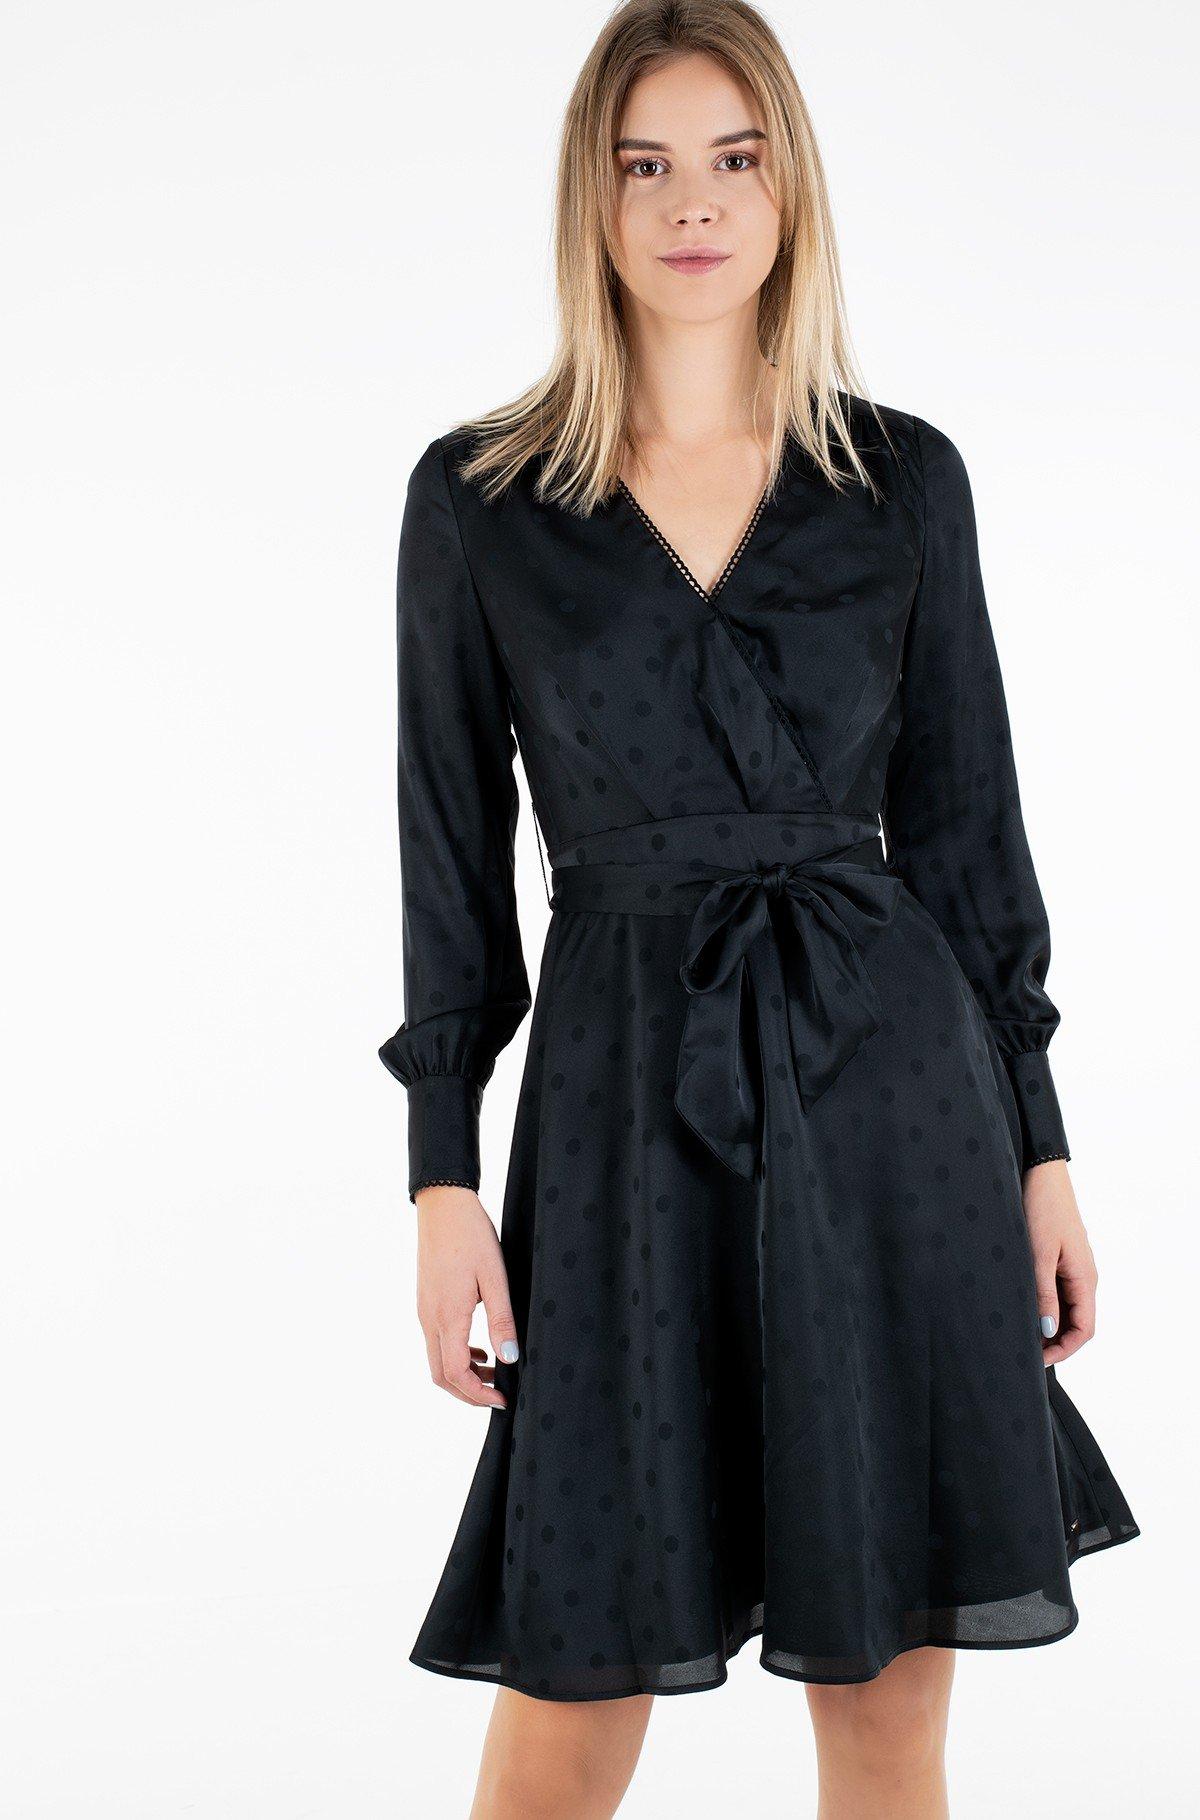 Suknelė POLKA DOT FIT&FLARE WRAP DRESS-full-1